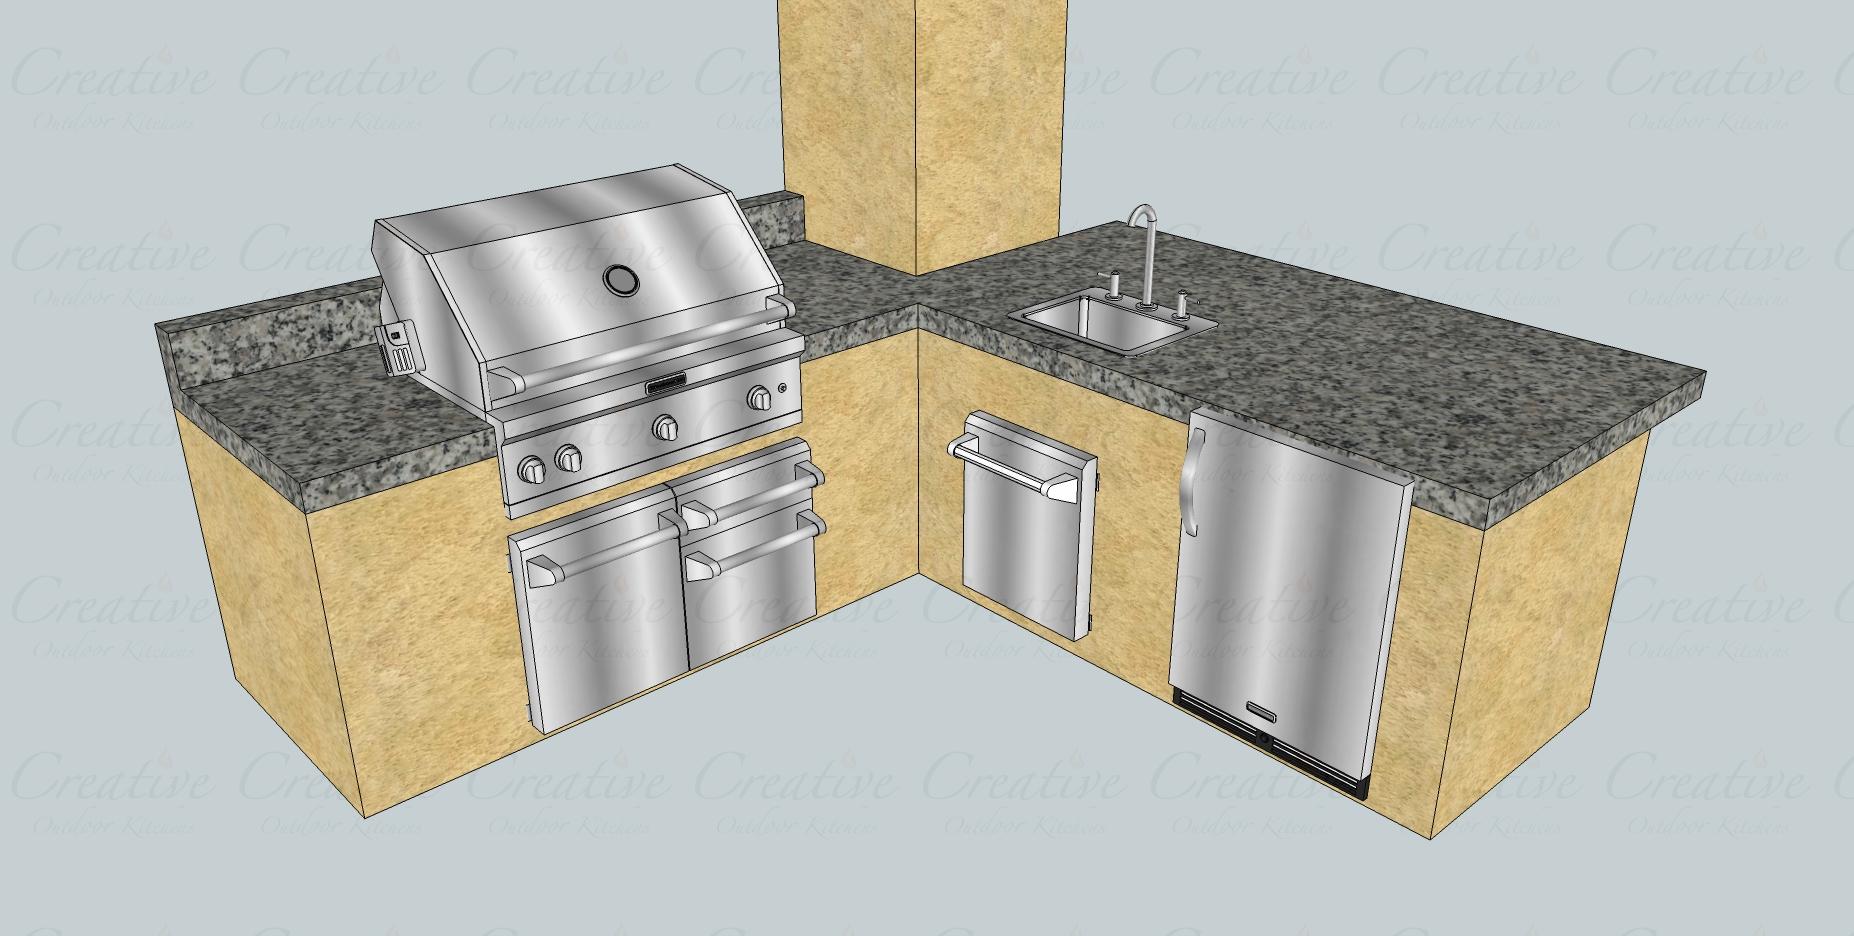 Robert Challoner Revised BBQ Design Component1.jpg